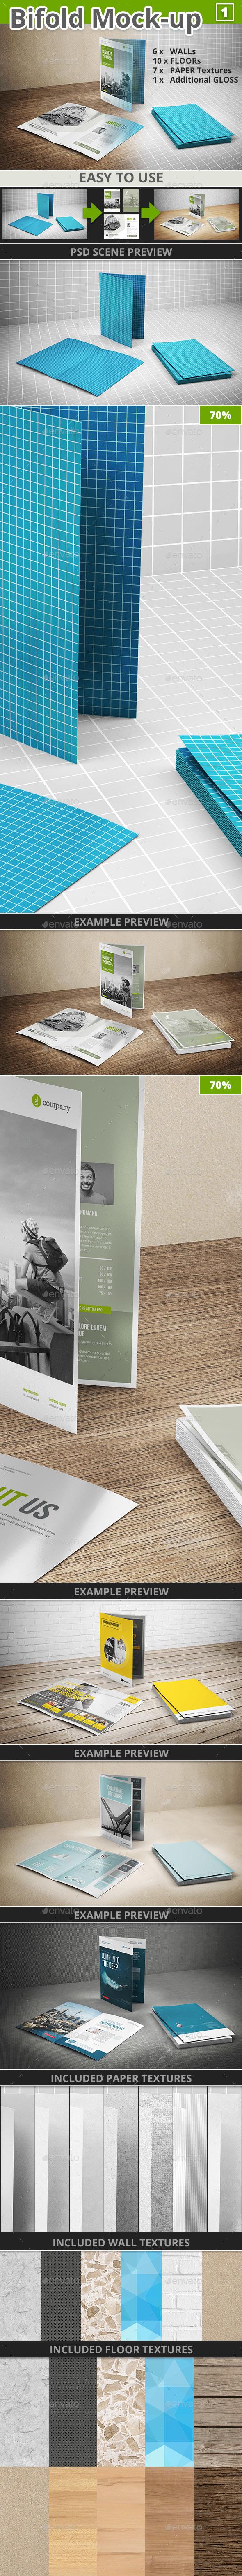 Bi-fold Brochure Mock-up 1 - Brochures Print